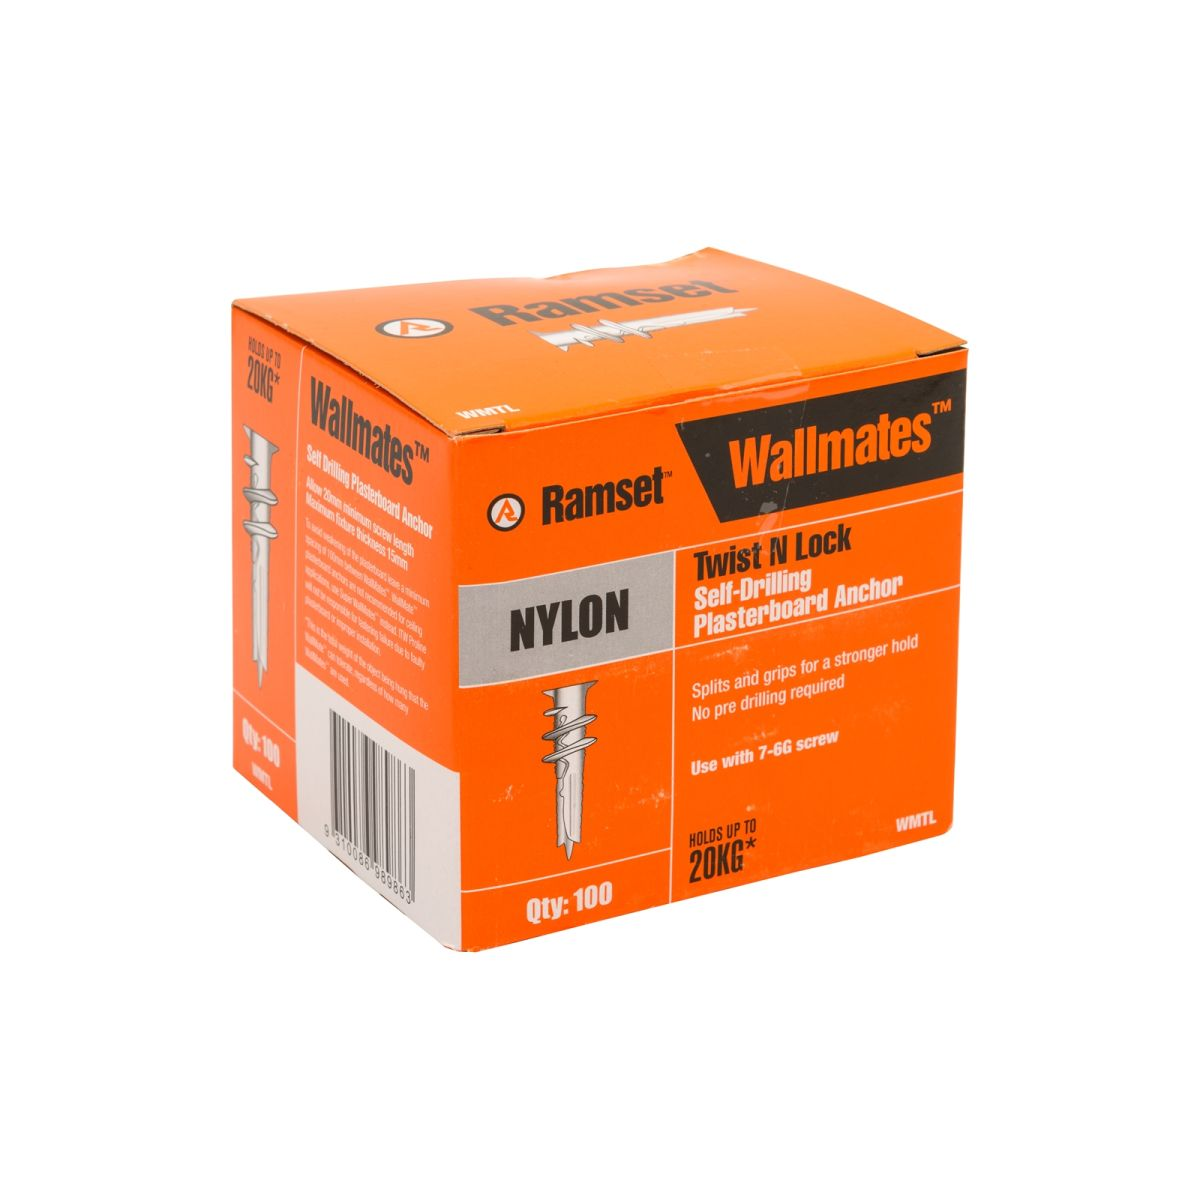 Ramset Wallmates Anchor Nylon Twist N Lock 20kg (100 Pack)